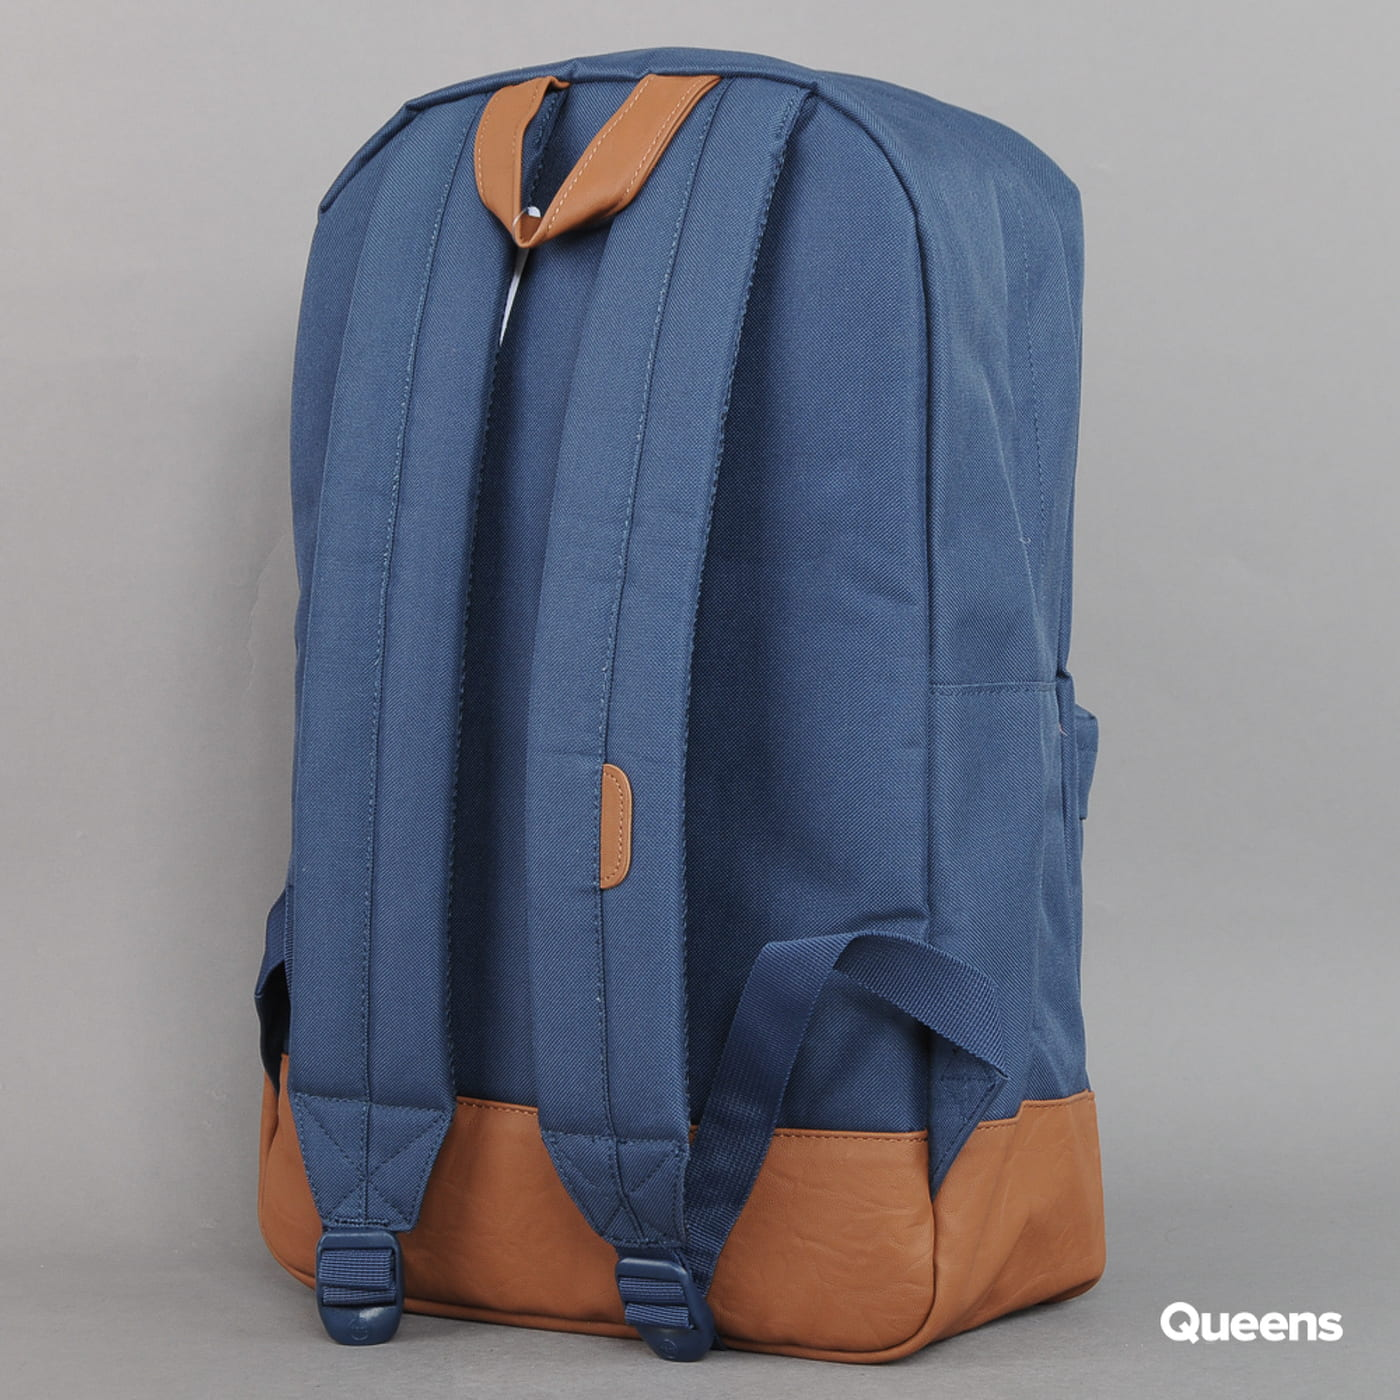 The Herschel Supply CO. Heritage Backpack navy / braun